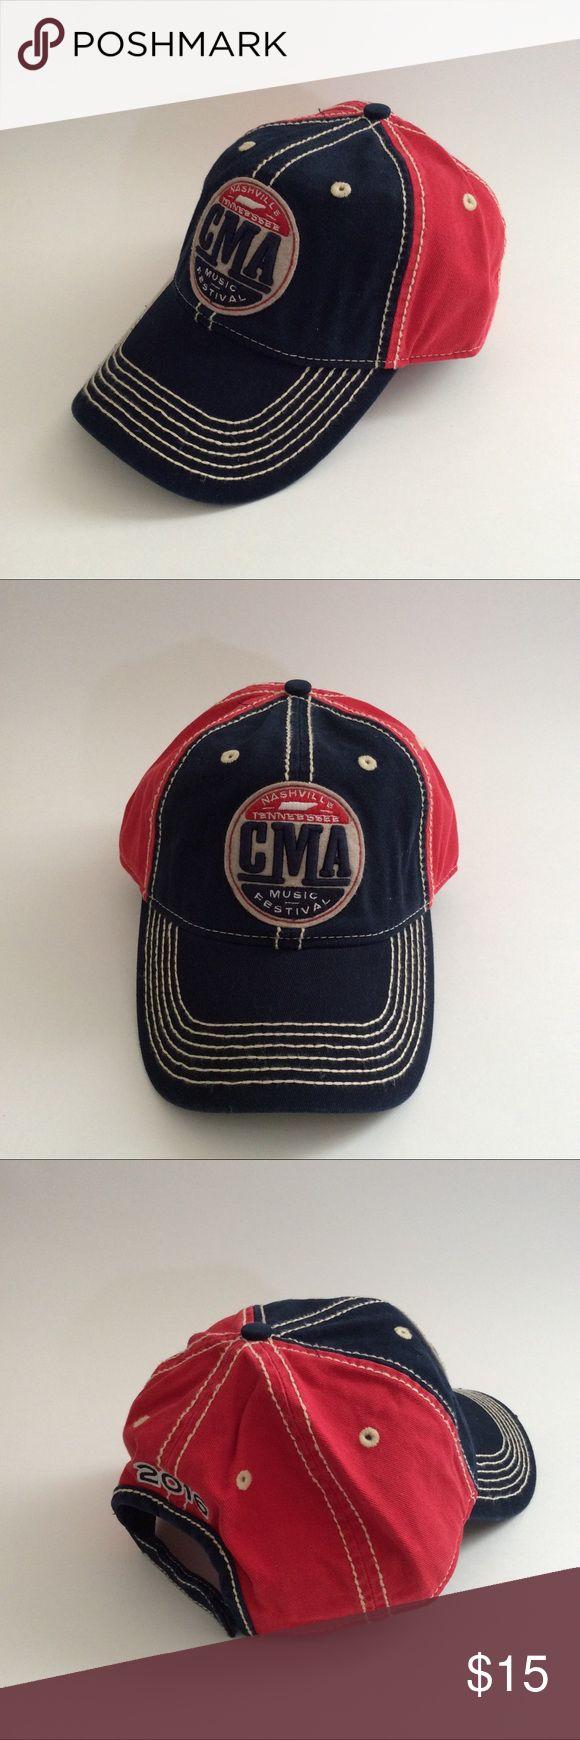 2016 CMA Music Festival Cap Hat 2016 CMA Nashville Music Festival Ball Cap/Hat. New. Never worn. Materials: 100% Cotton ~❌SWAP❌TRADE ~ ✔️❤️Bundles📦💕 ~✔️Smoke-free/pet-free home CMA Accessories Hats